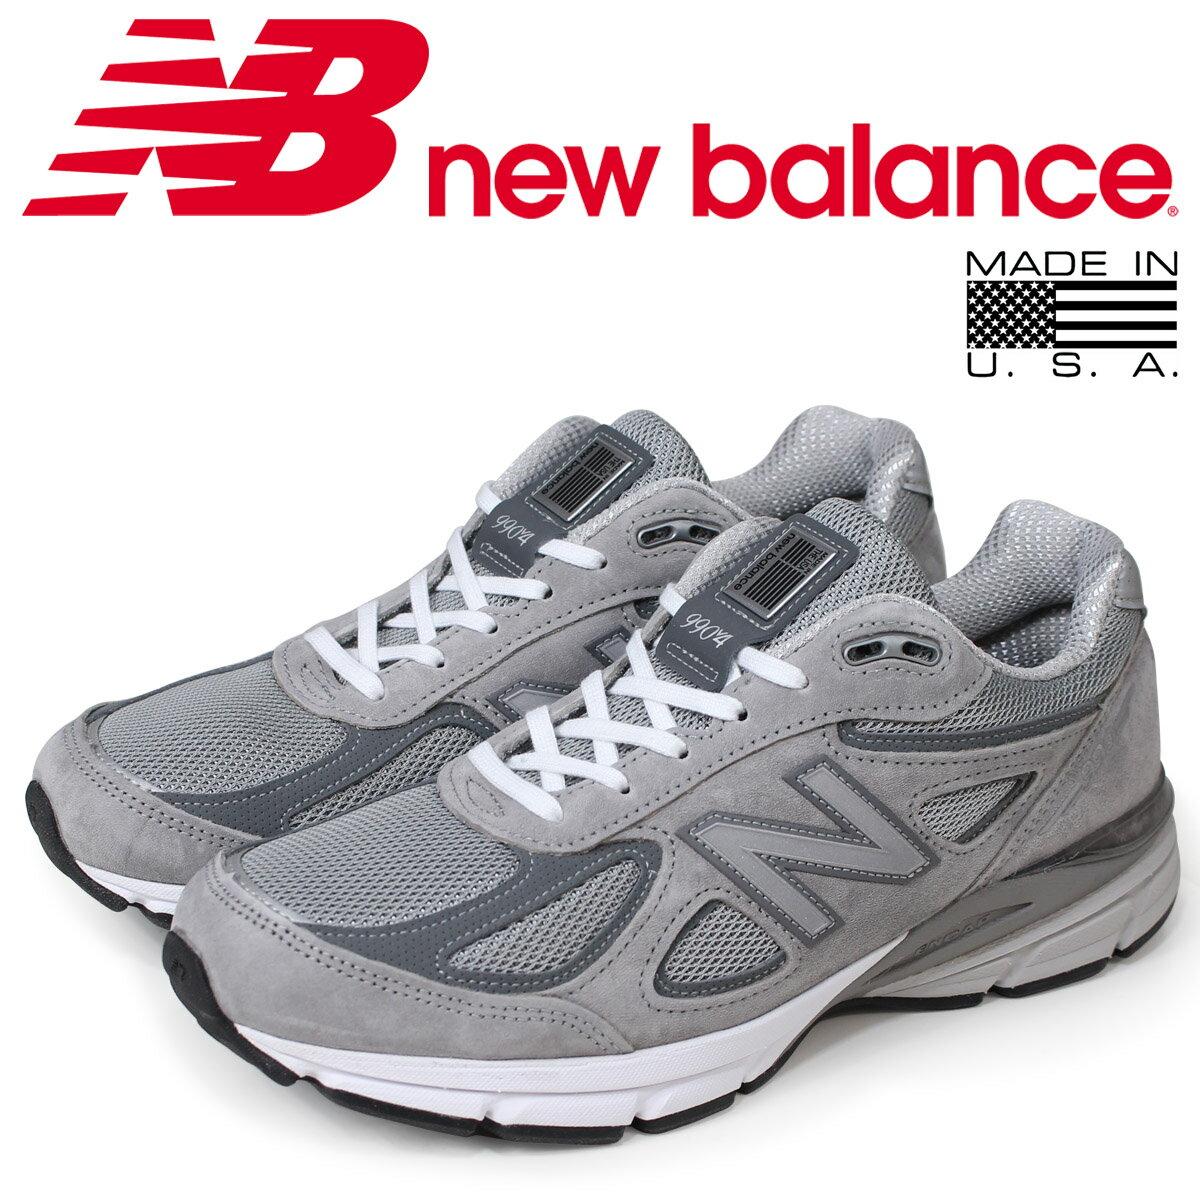 promo code 4d8e5 2d873 new balance New Balance 990 sneakers men D Wise gray M990GL4